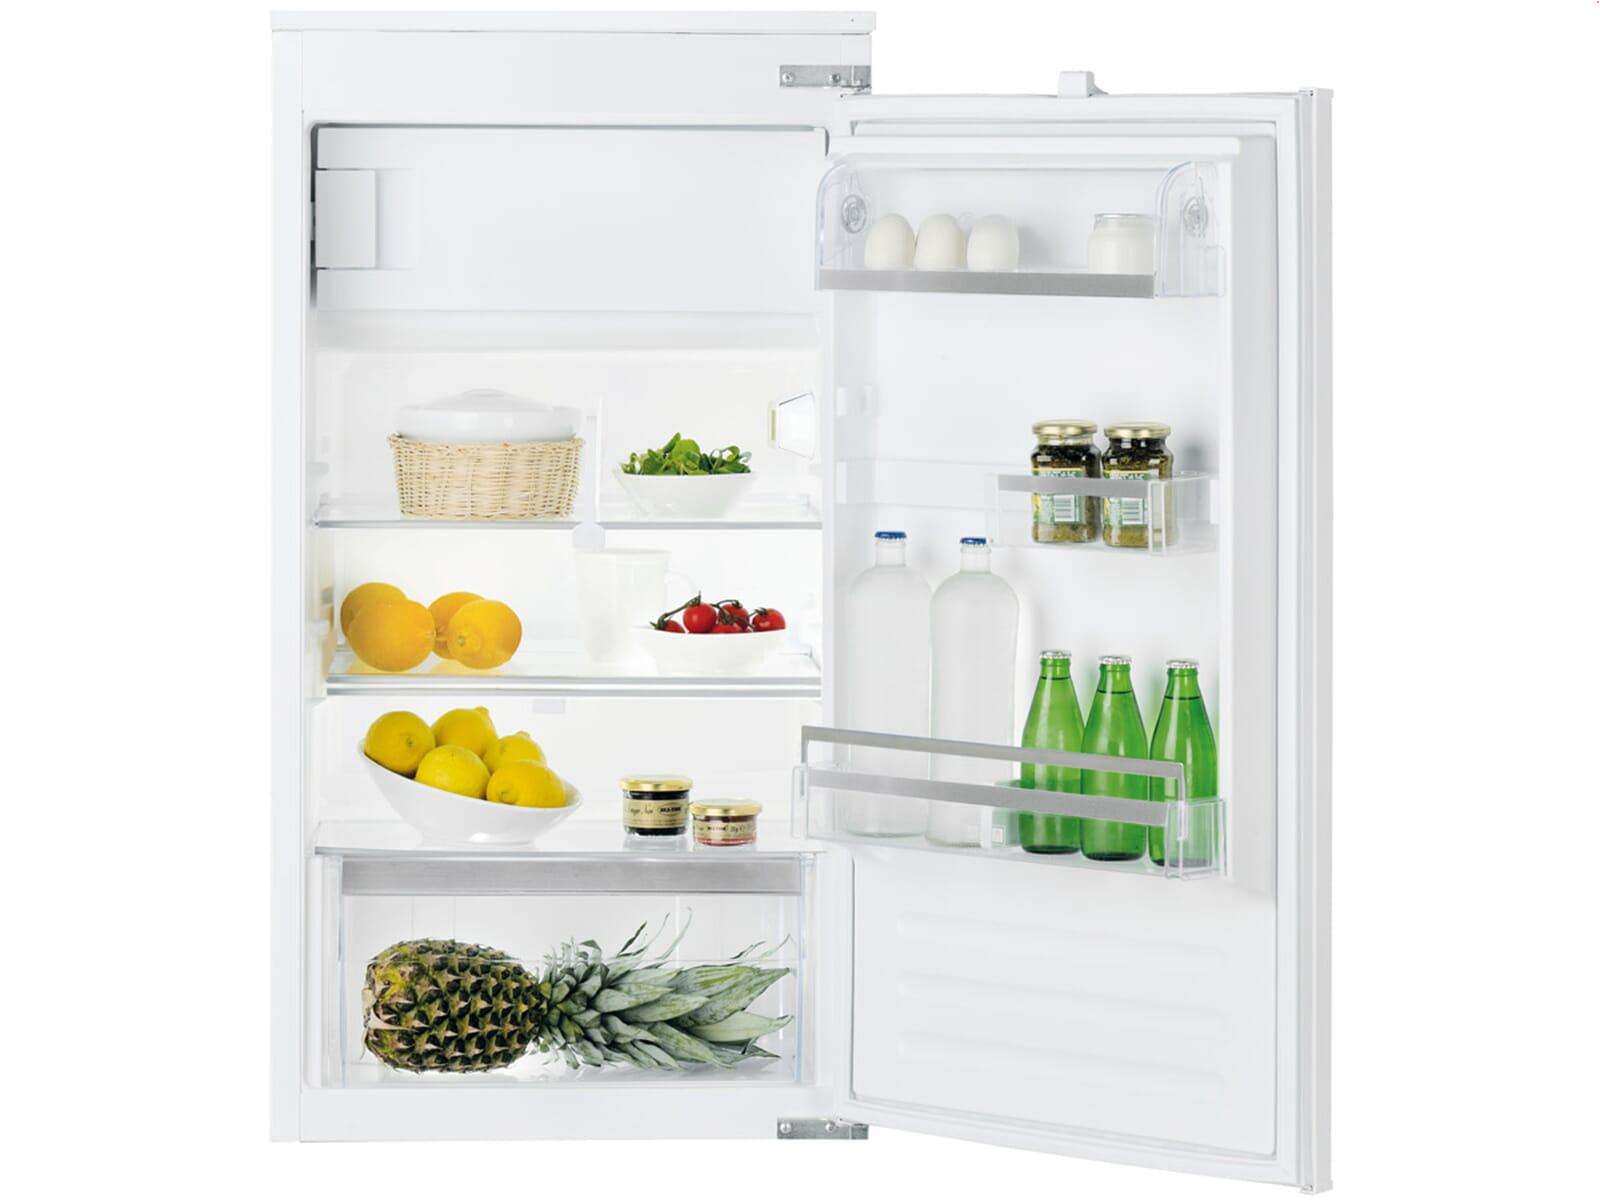 Produktabbildung Bauknecht KVIE 1103 A++ Einbaukühlschrank